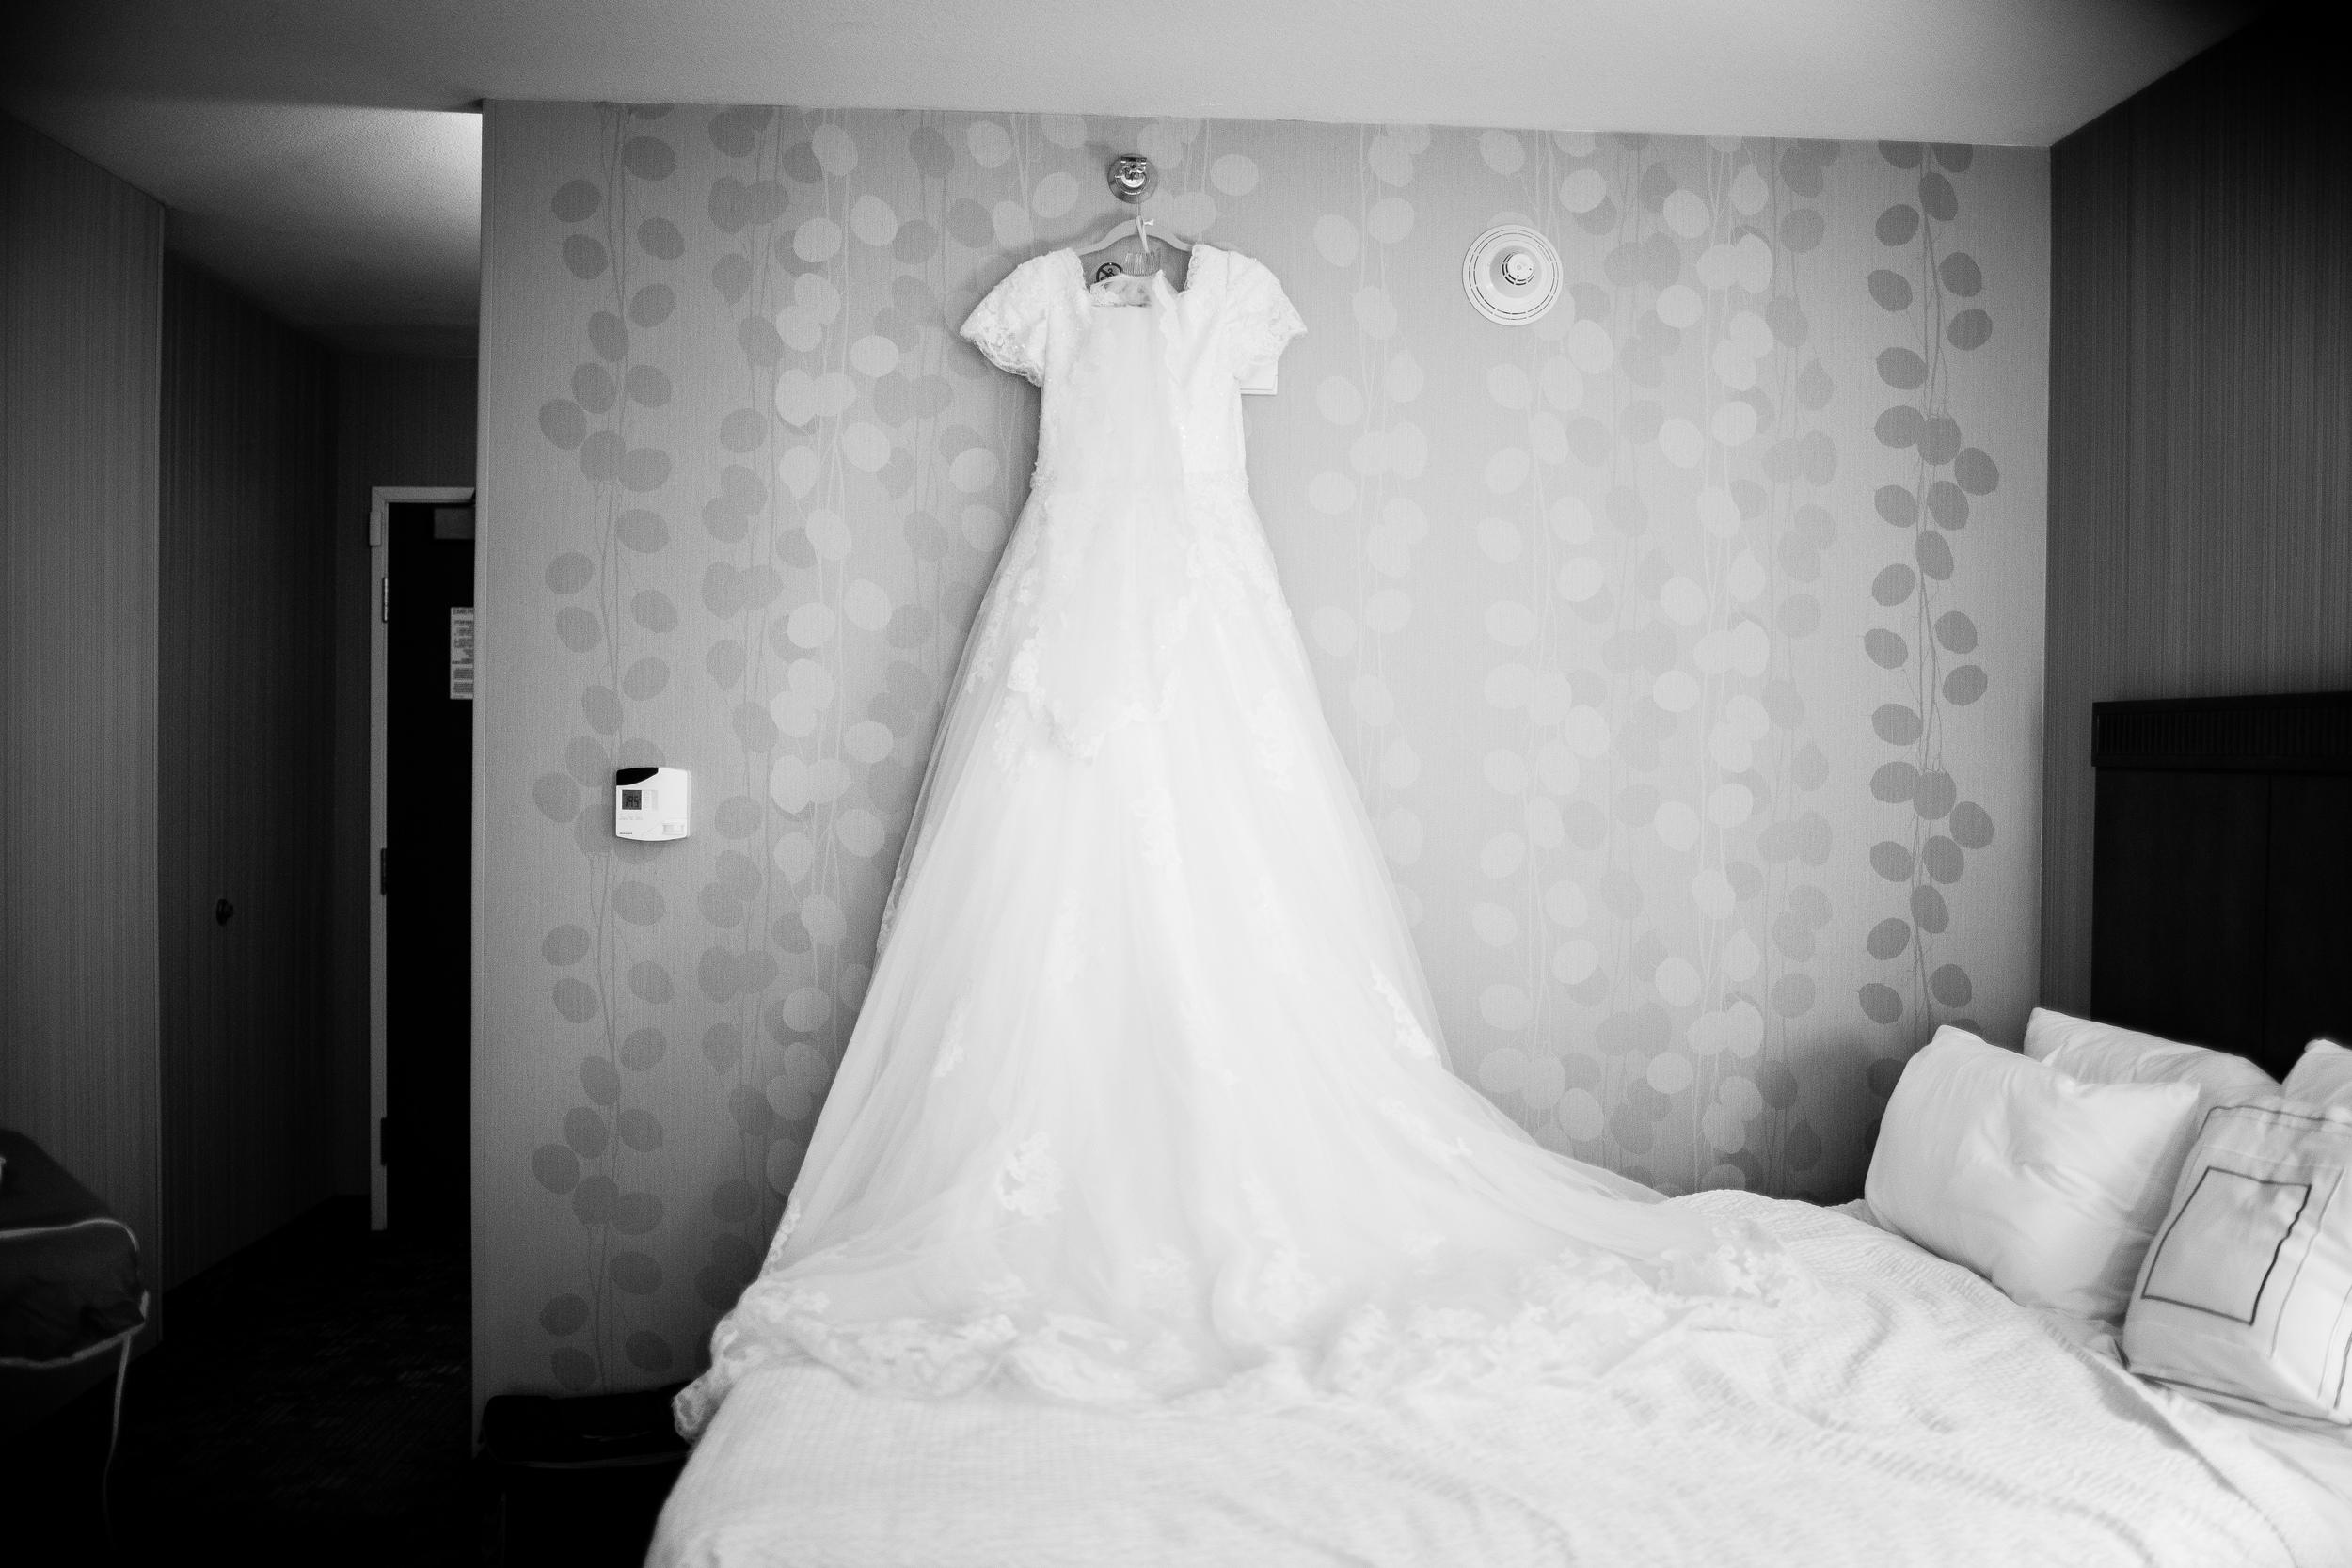 Hotel-8599.jpg